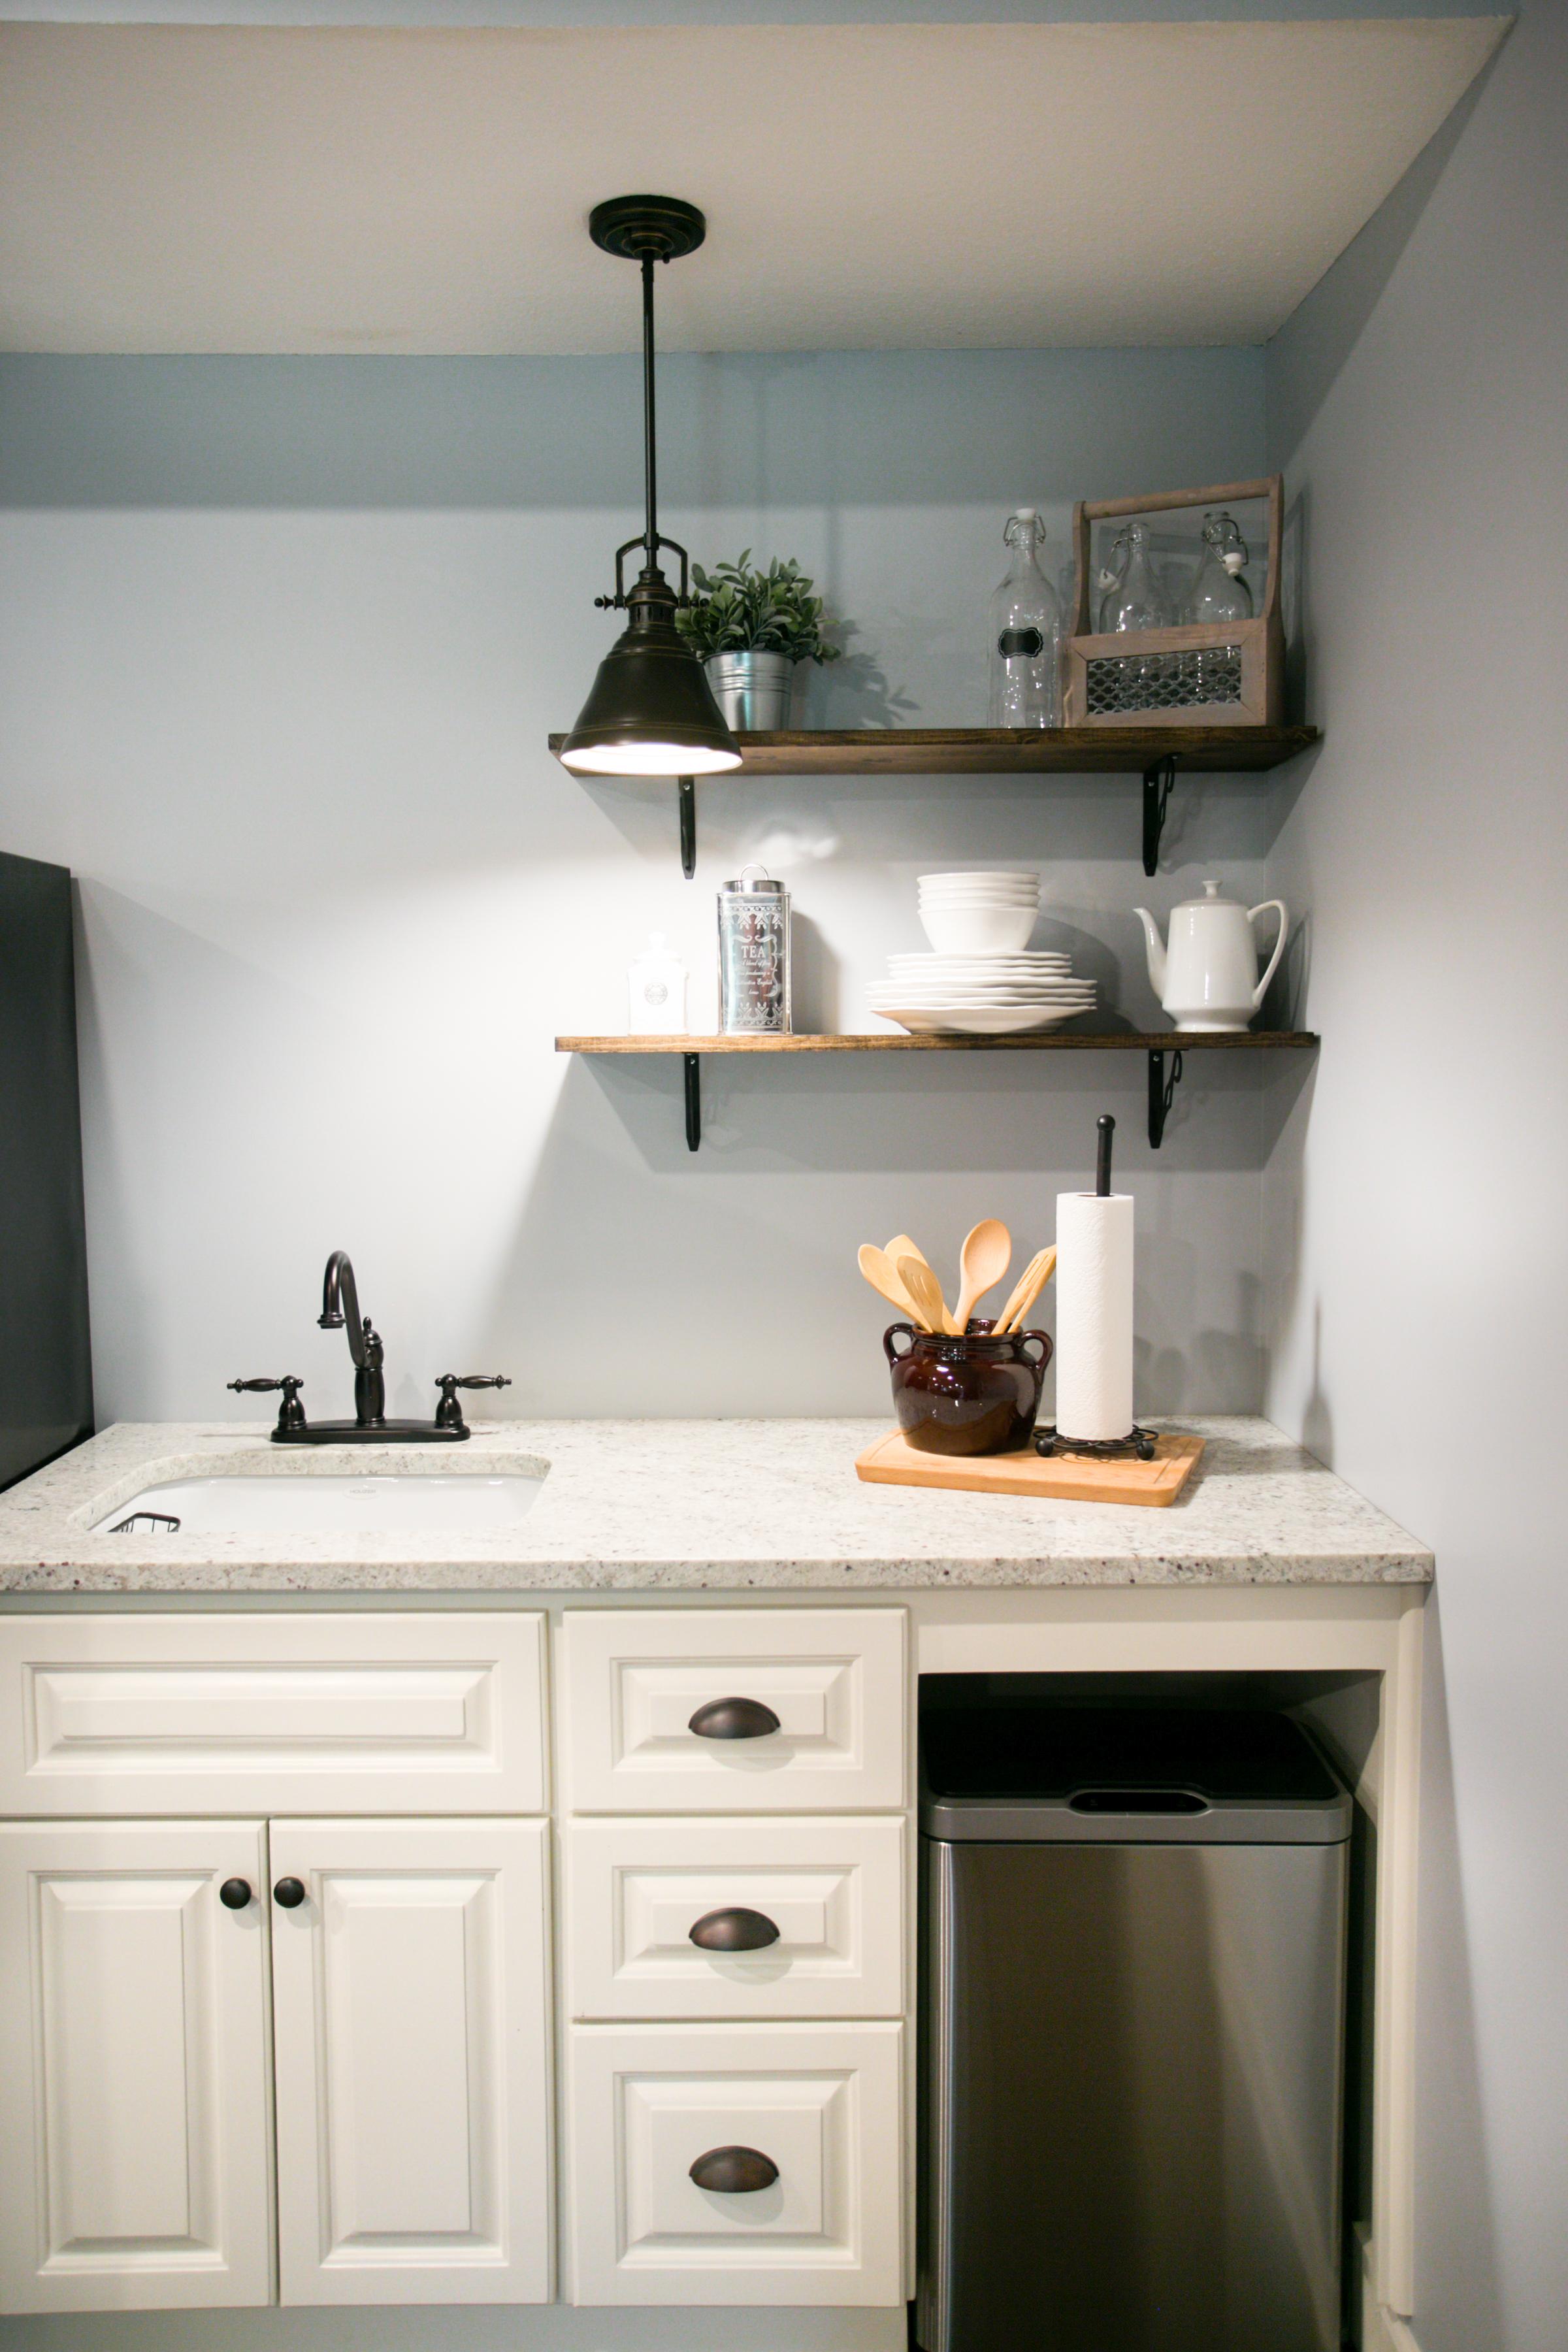 kitchenette-basement remodel